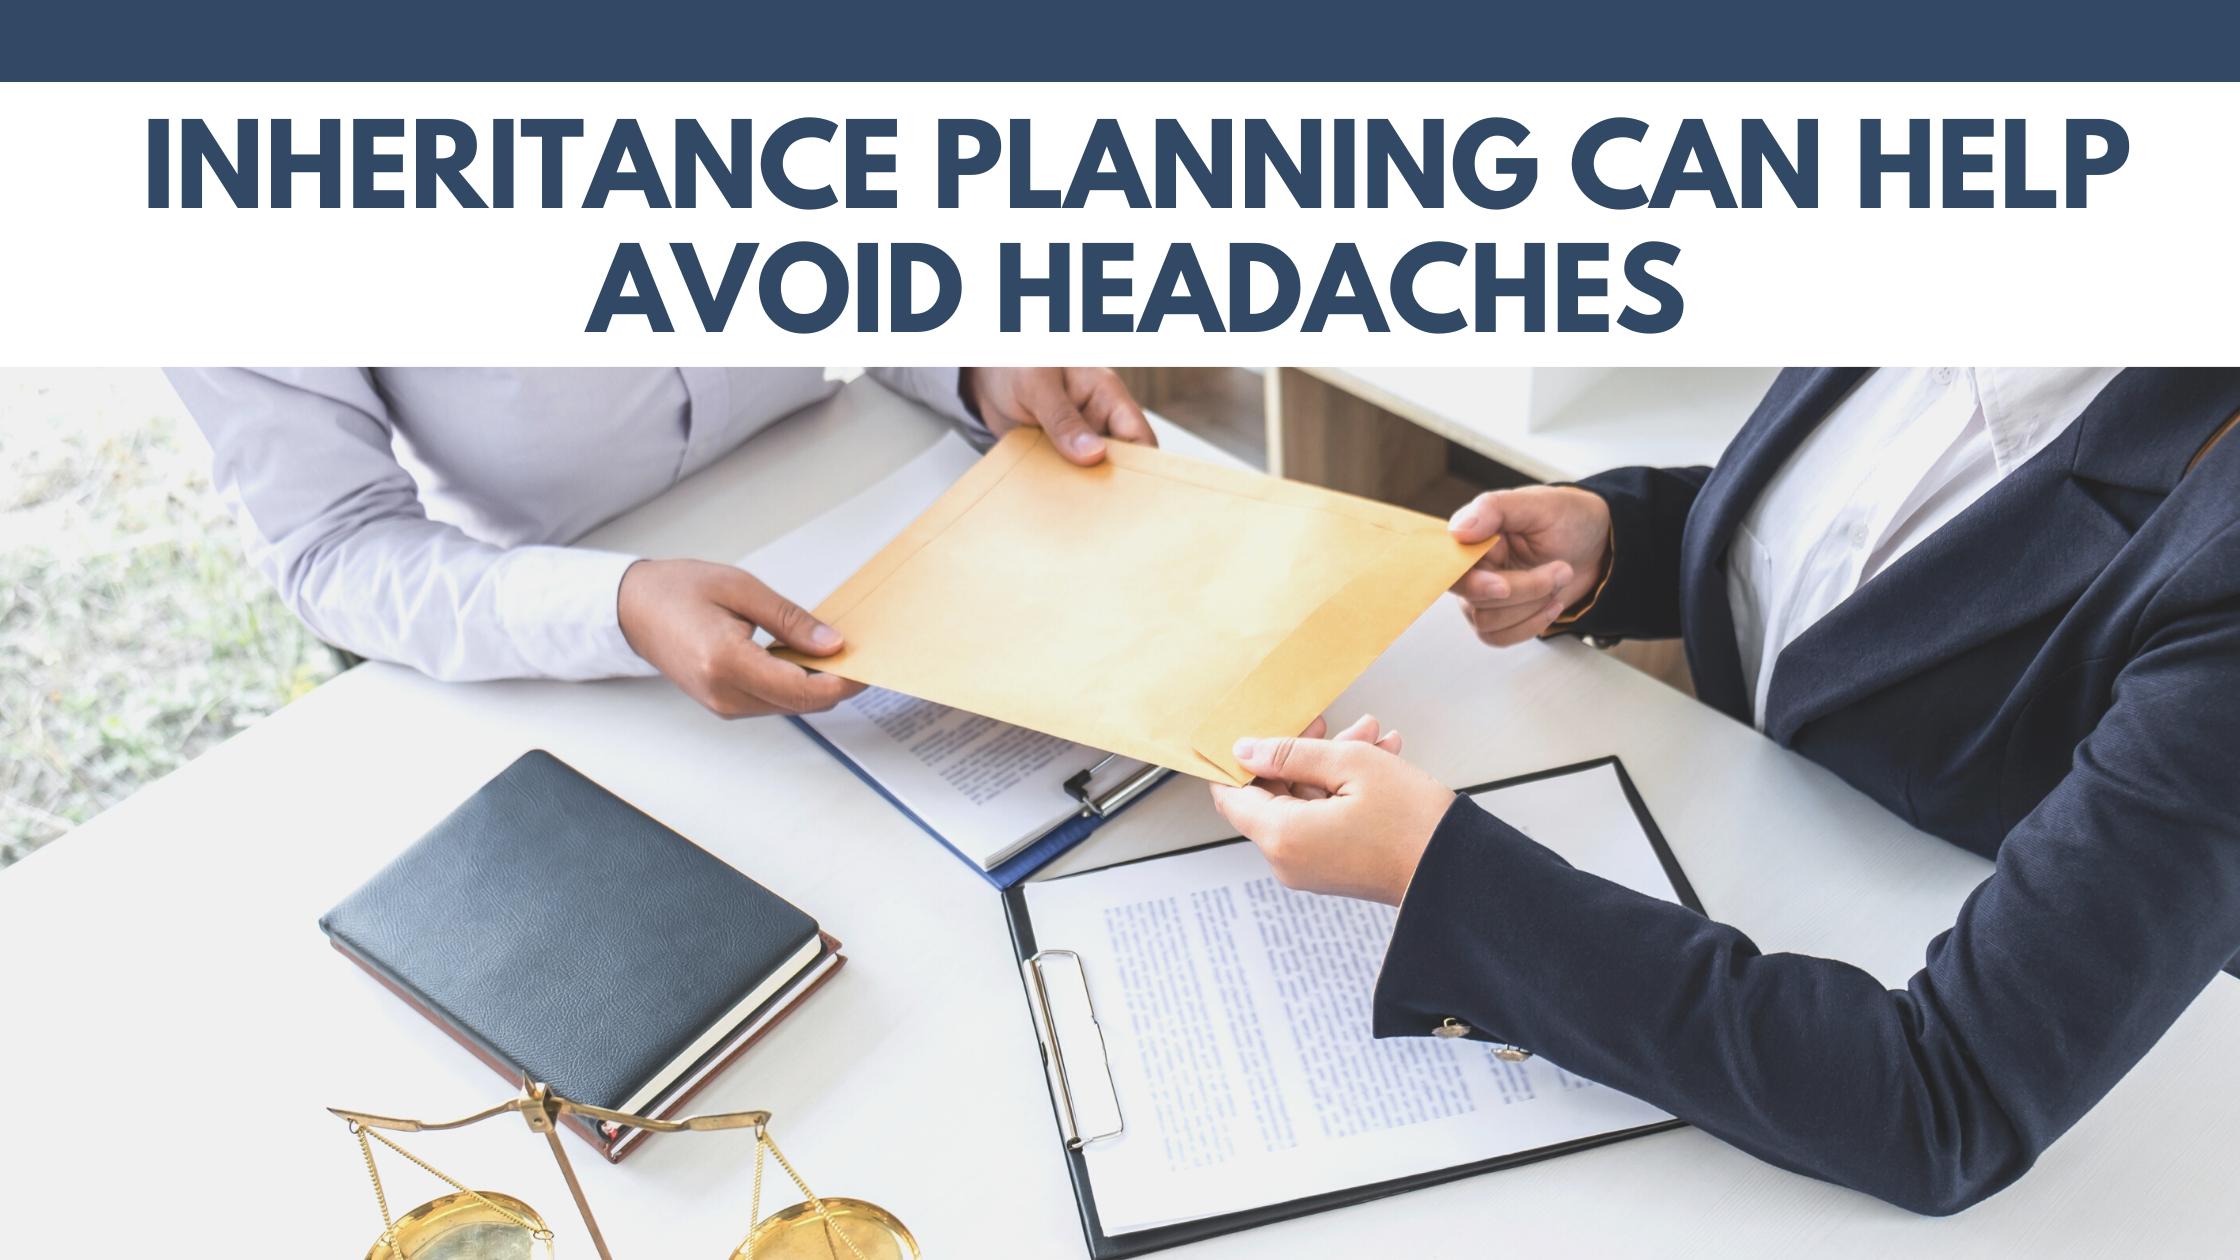 Inheritance Planning Can Help Avoid Headaches  Thumbnail